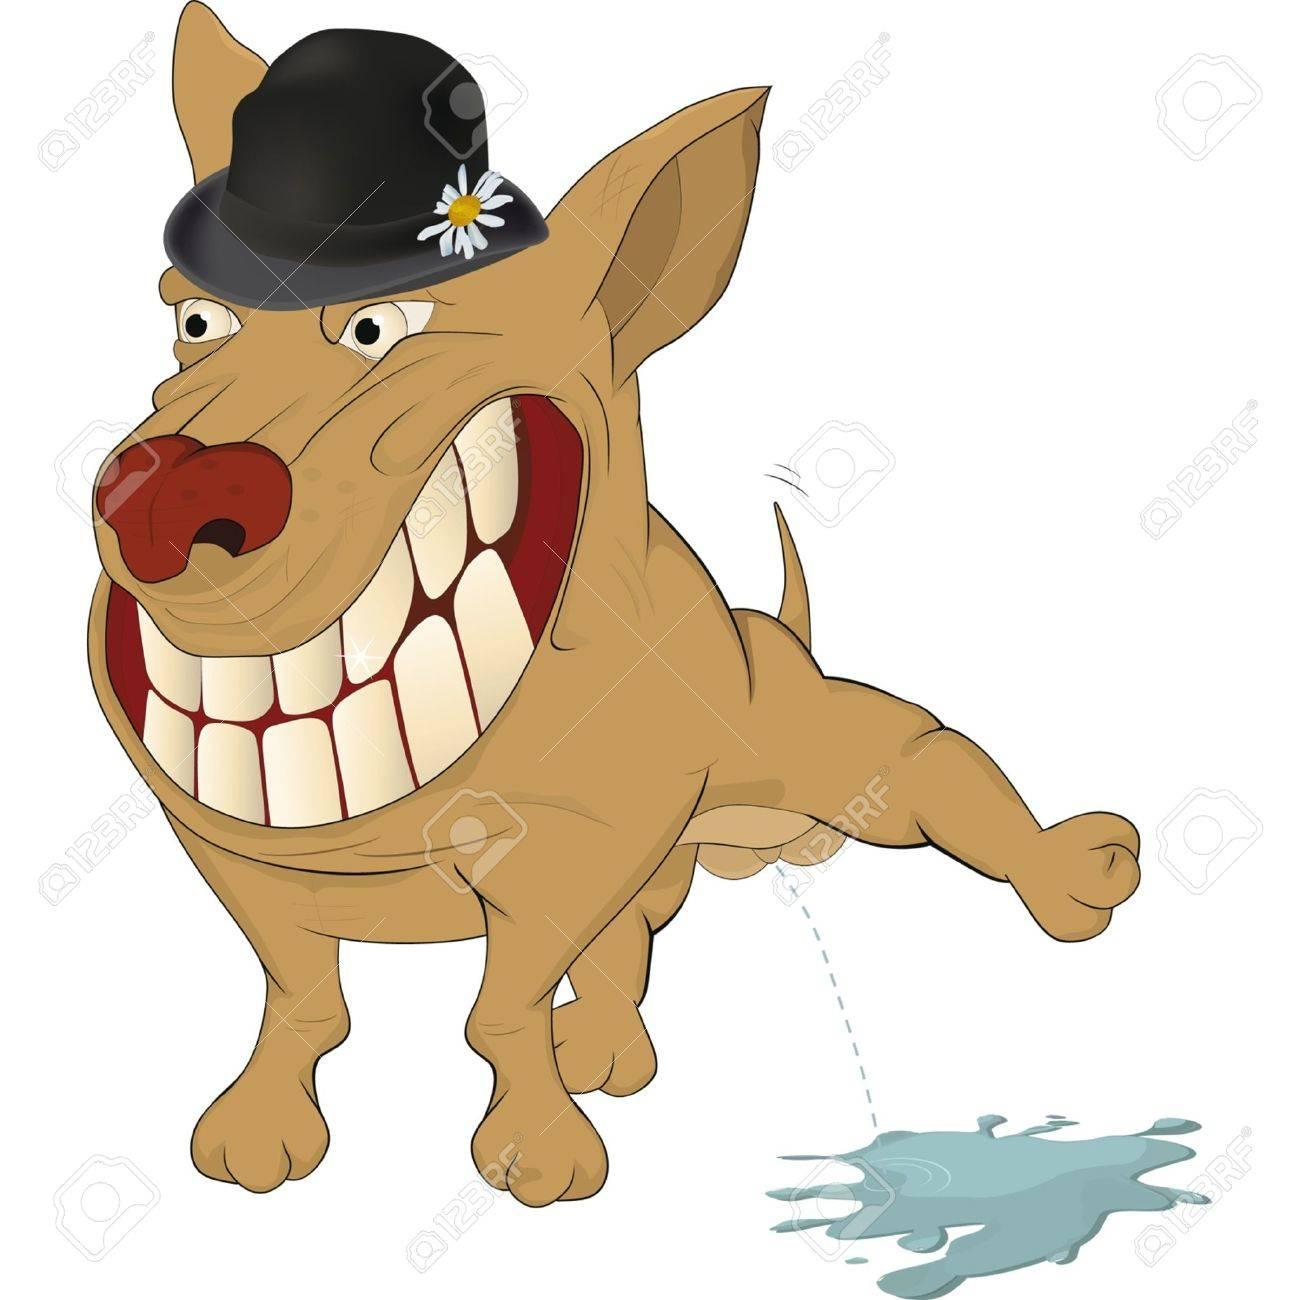 Very cheerful dog. Cartoon Stock Vector - 13679925